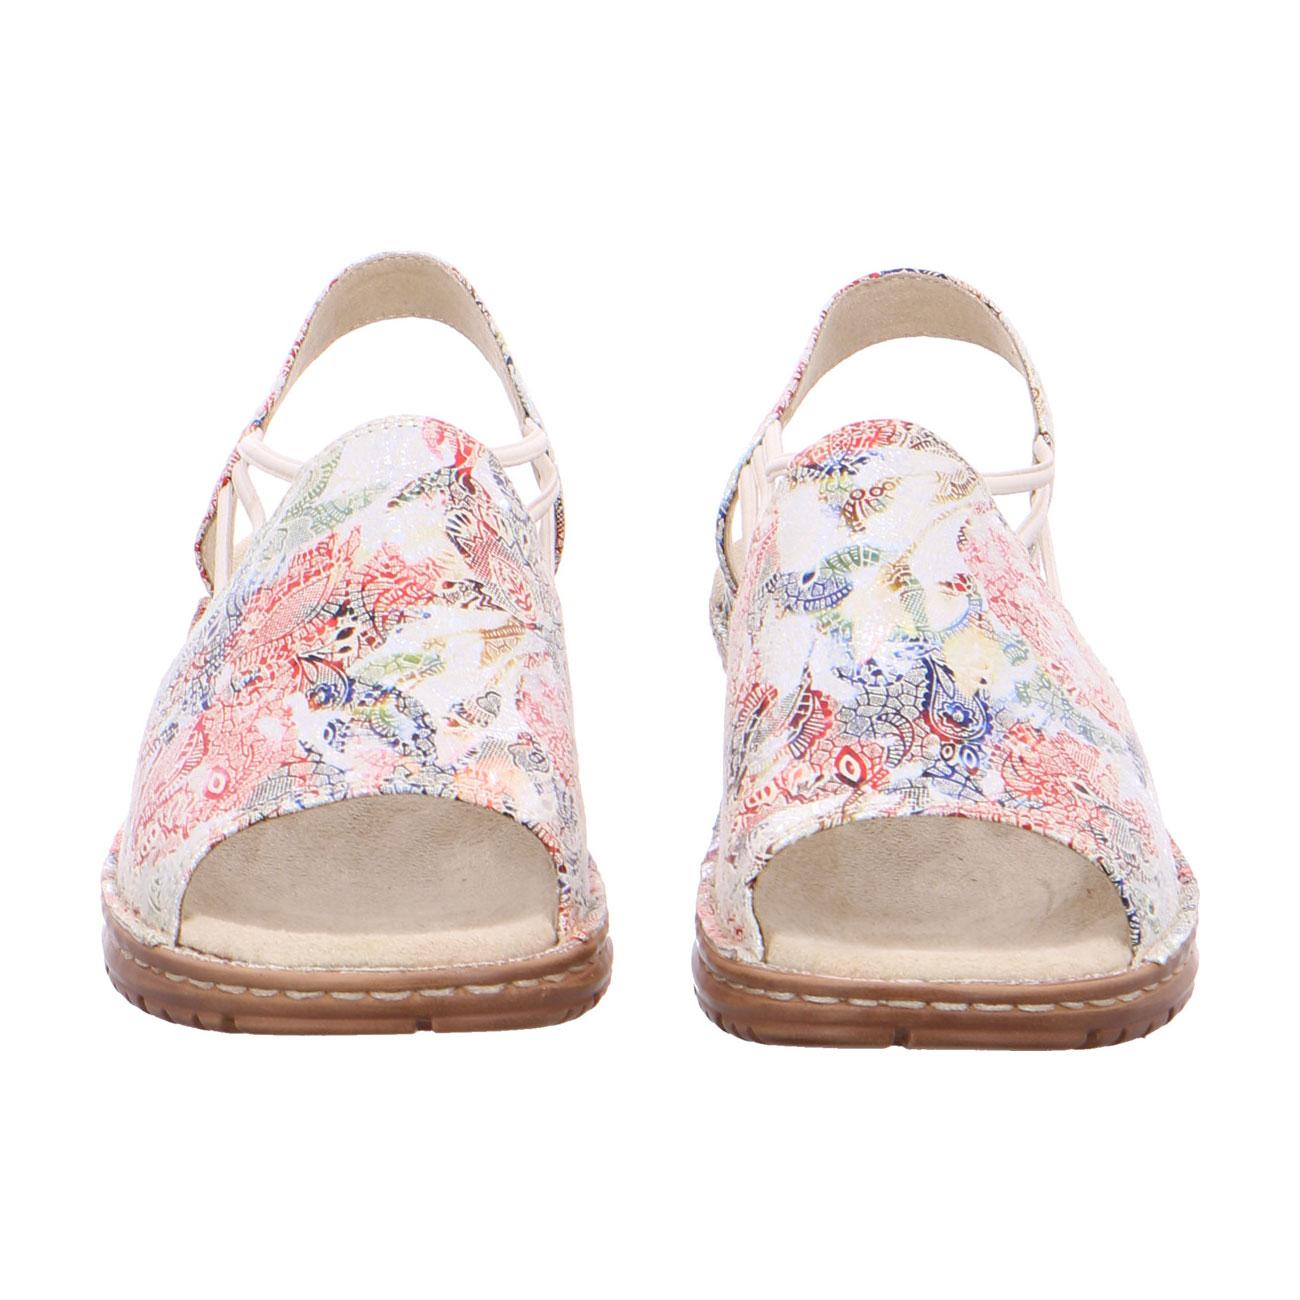 Дамски сандали с ластици Ara Hawaii multi 12-27241-73 шарени - снимка 6